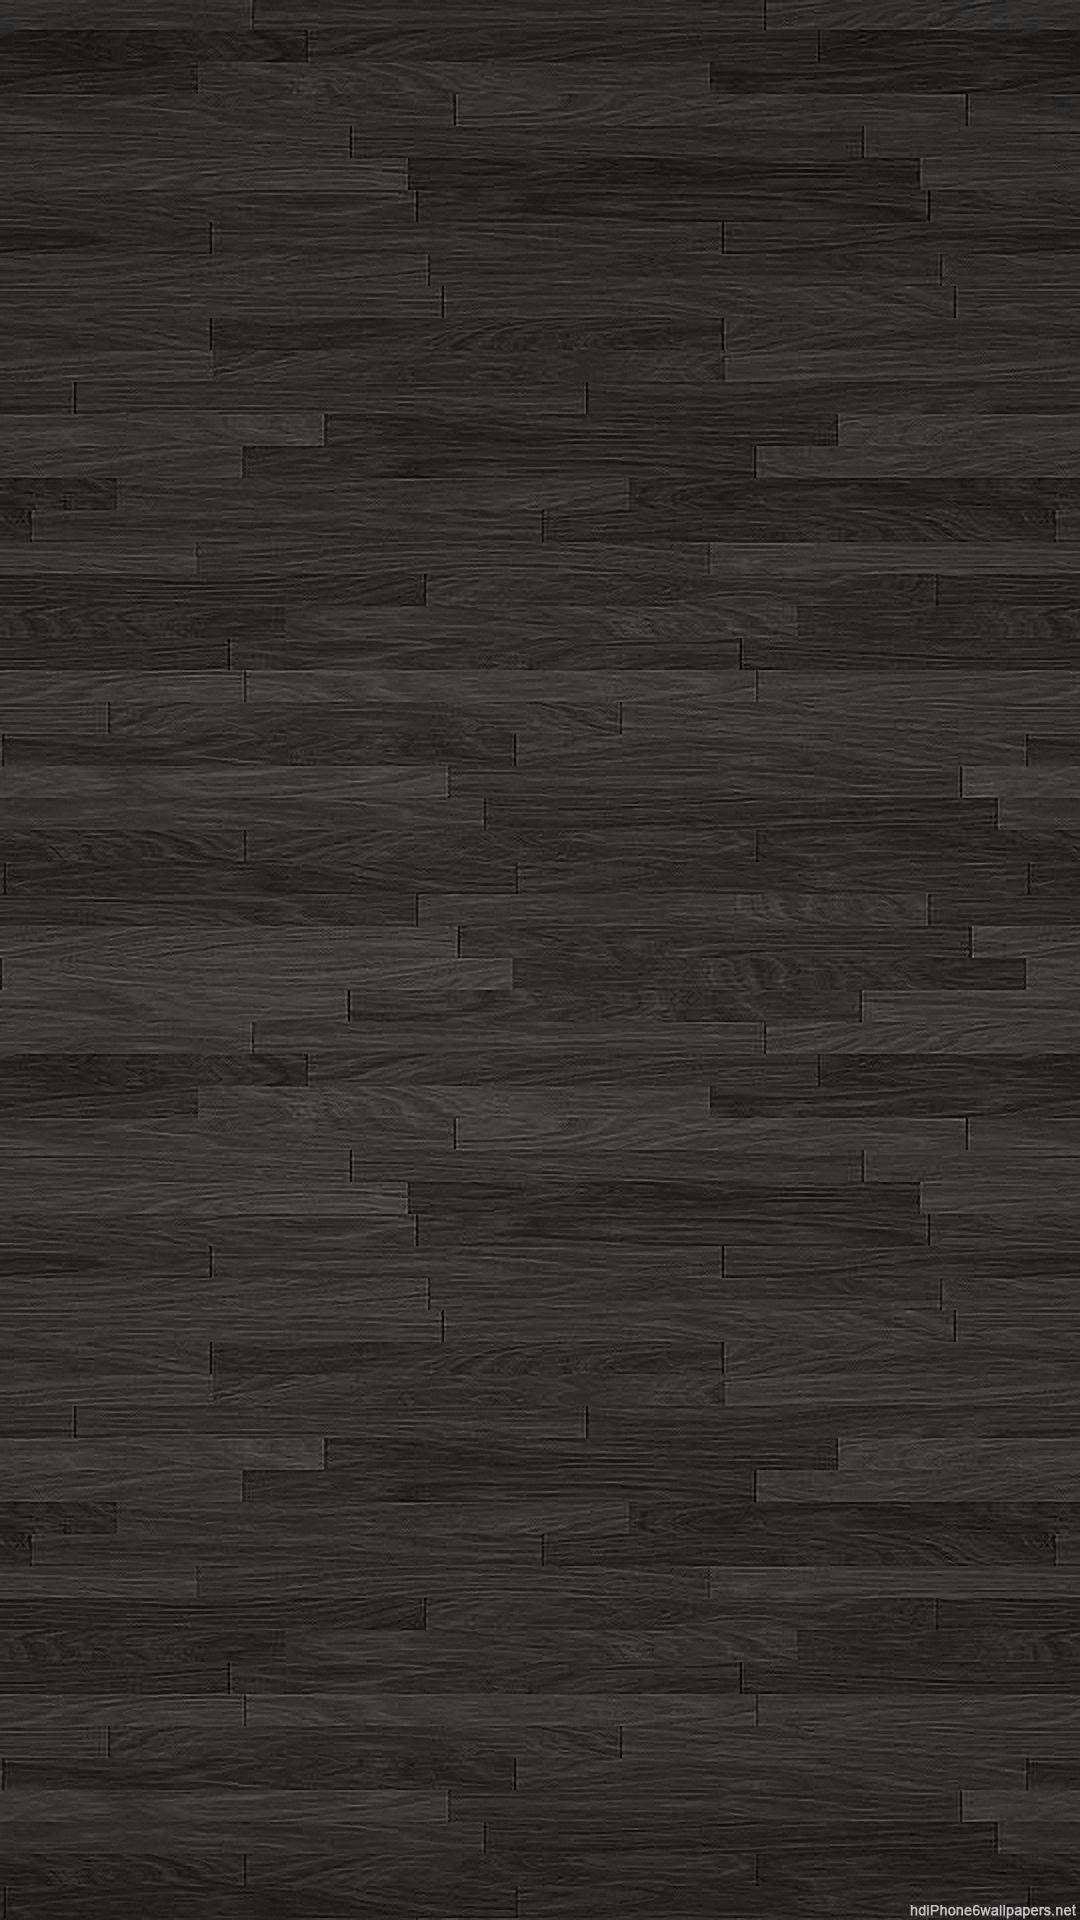 plus black iphone wallpaper Car Pictures 1080x1920